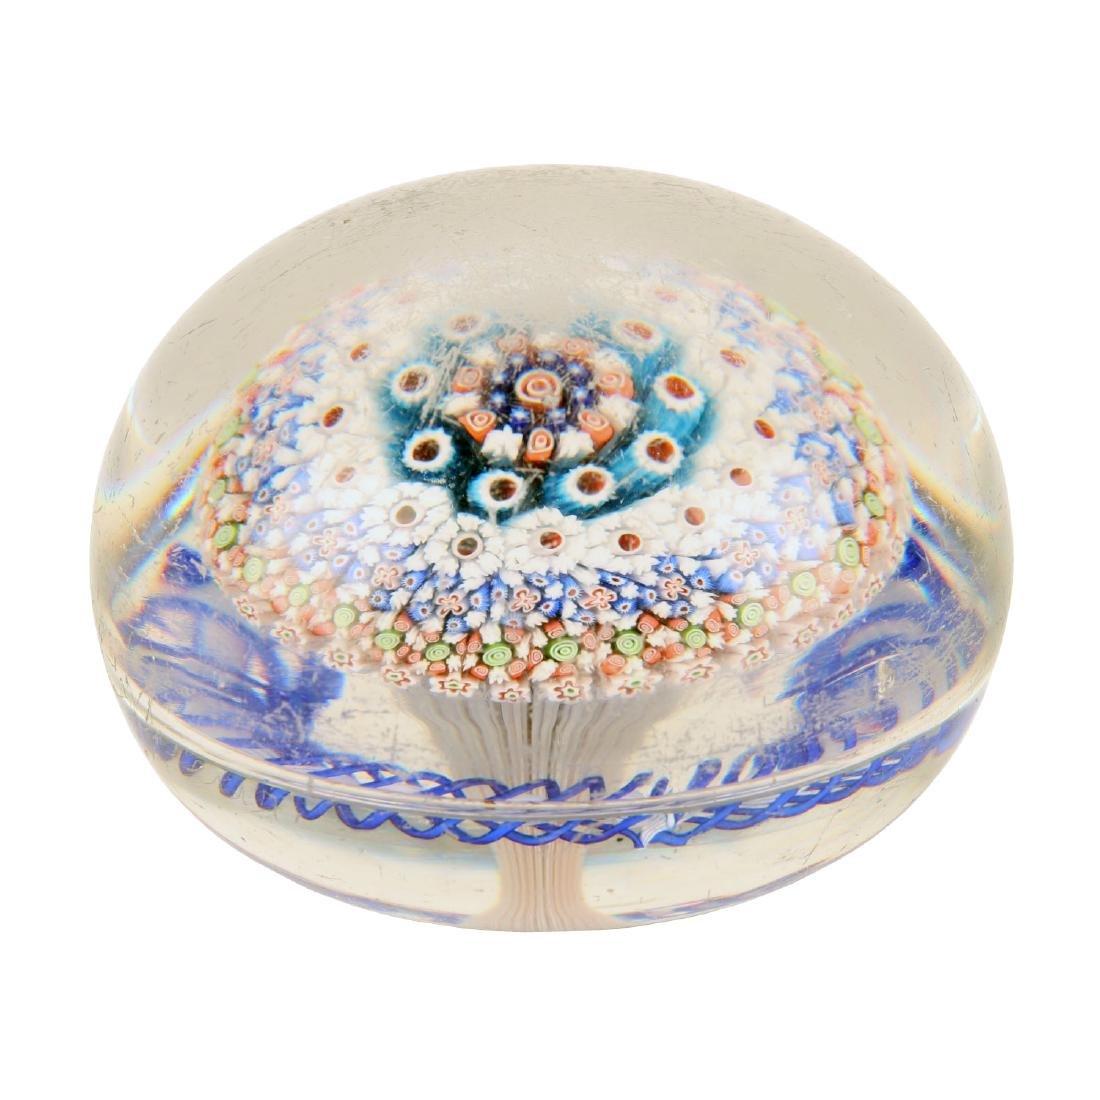 Baccarat Millefiori Art Glass Paperweight